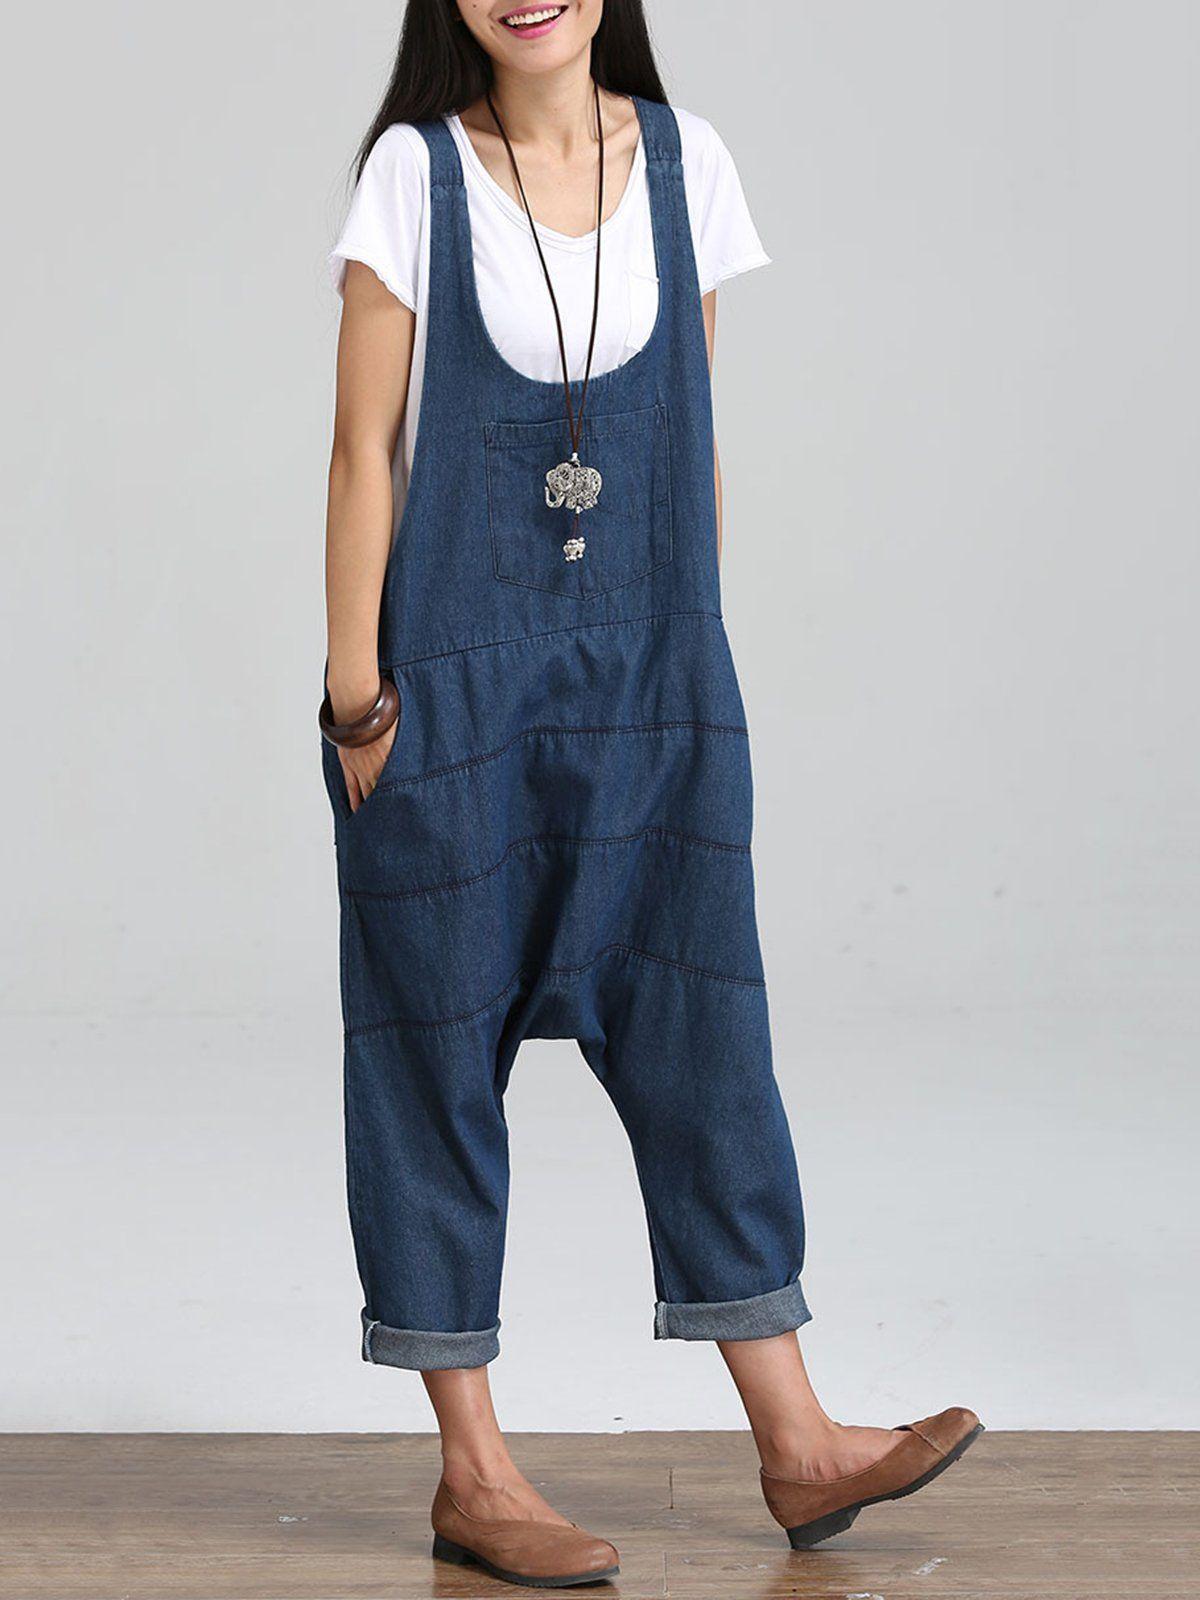 0f66b2da954 Sleeveless U-Neck Plain Casual Plus Size Jumpsuits – RosyMerry ...